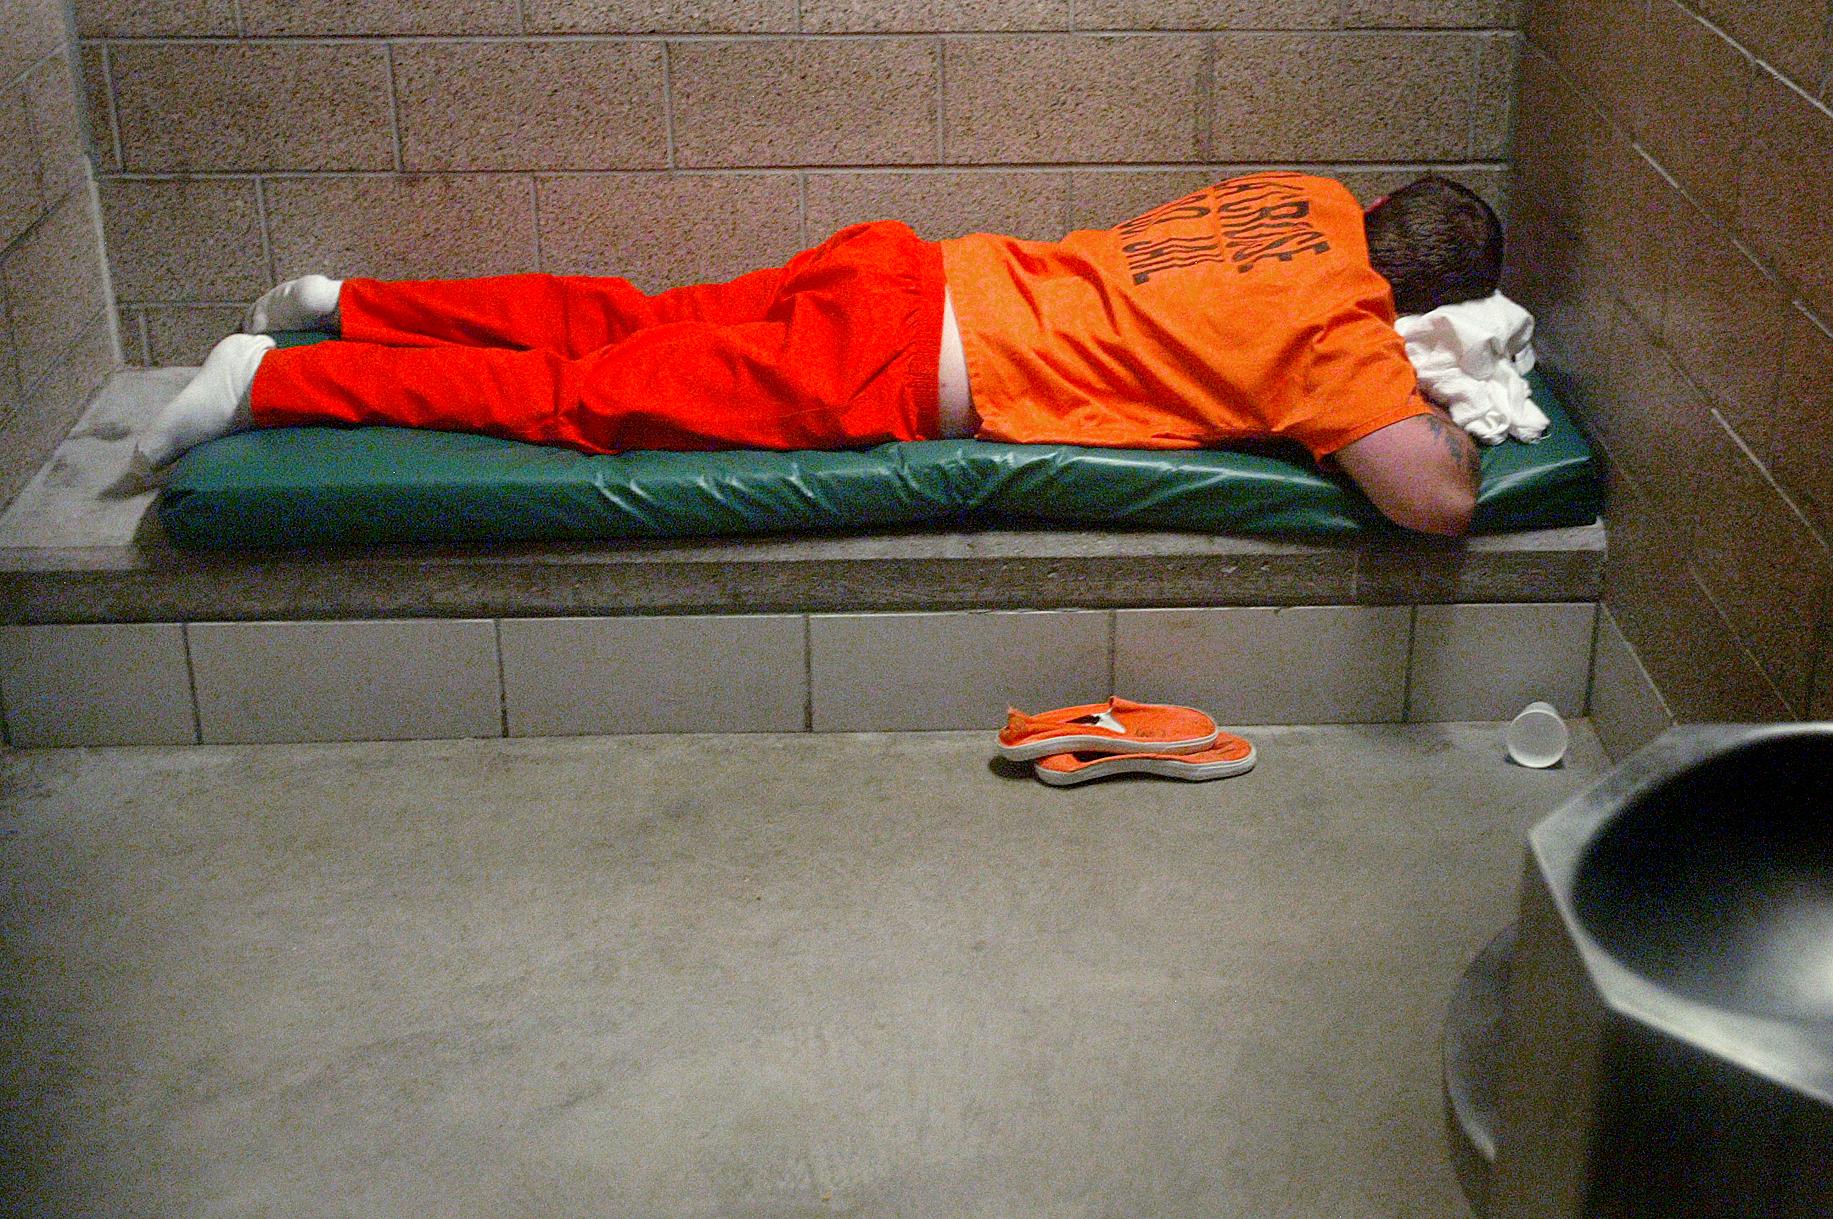 Biophilic Design in Prisons